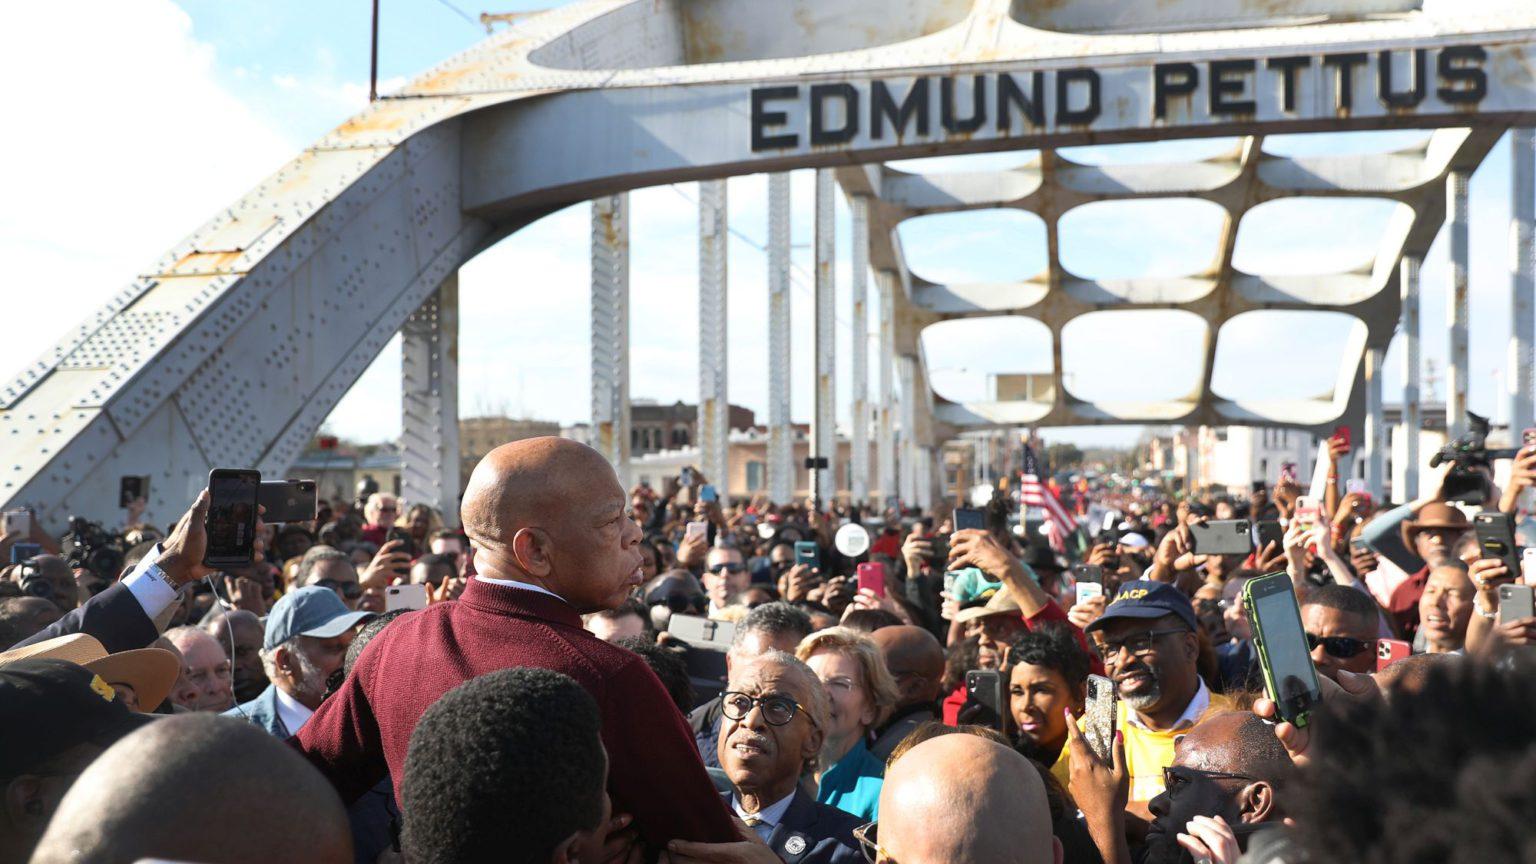 Why John Lewis didn't want the Edmund Pettus Bridge renamed